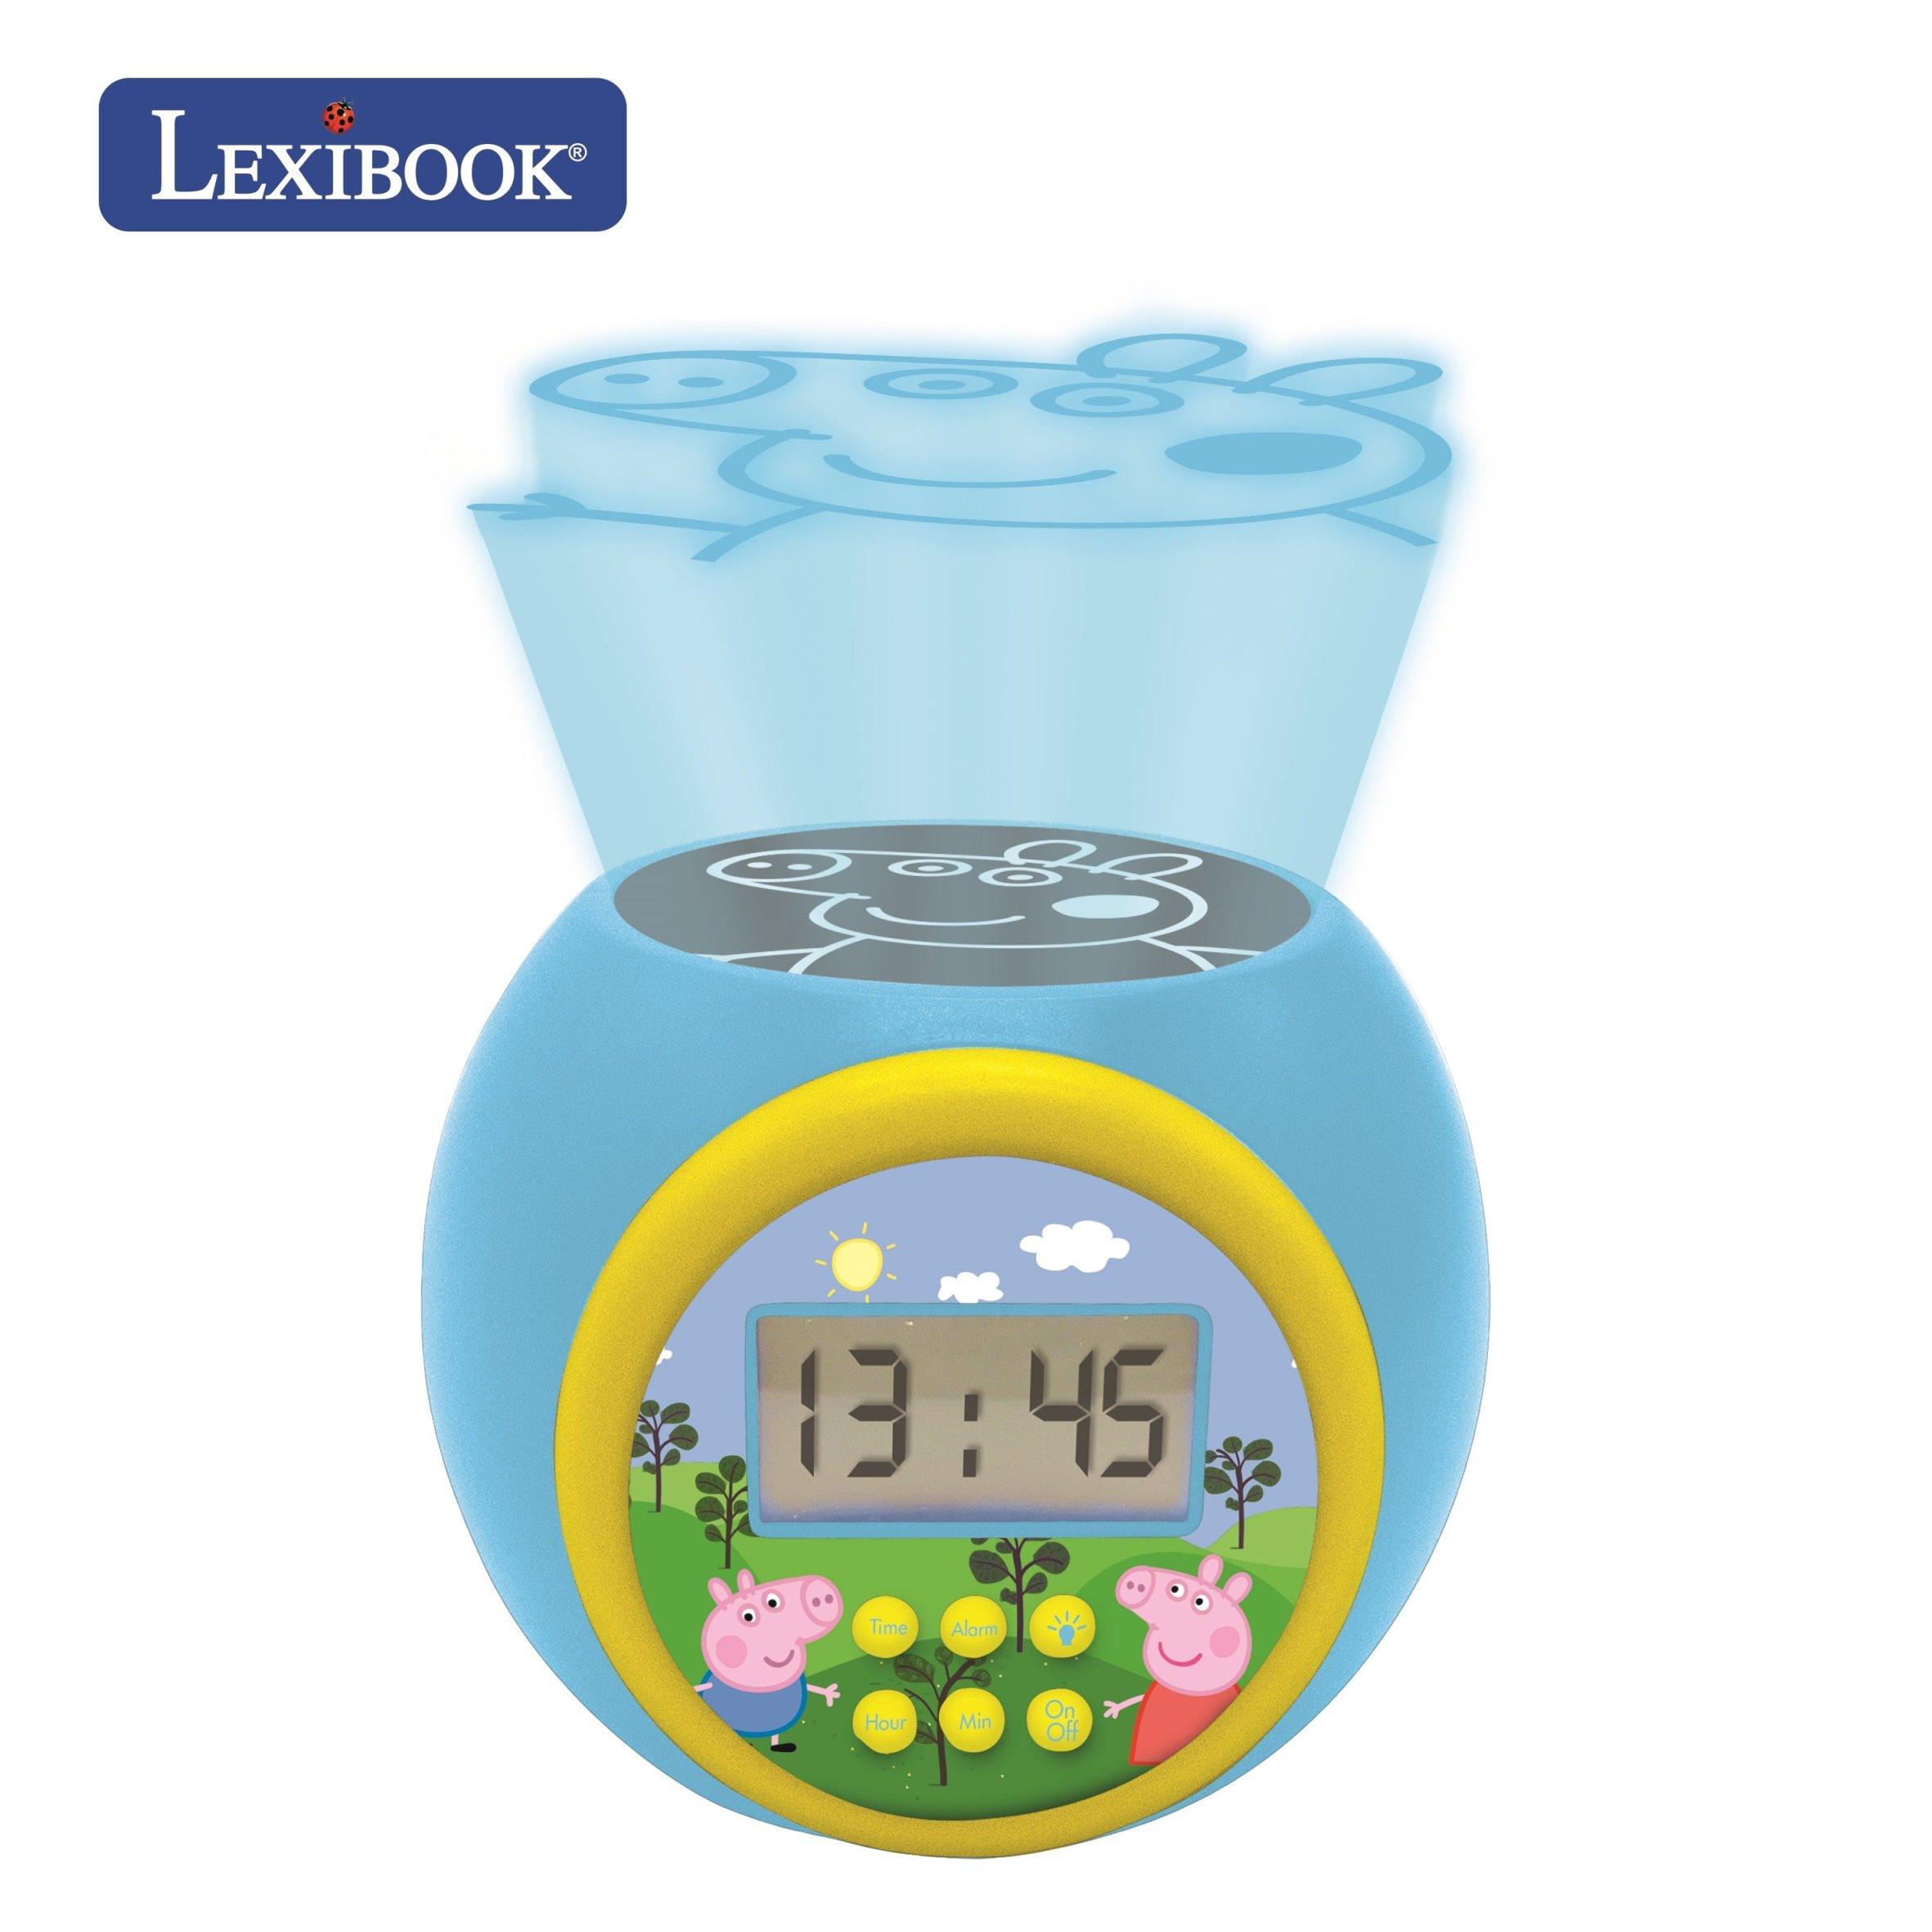 Lexibook - Peppa Pig Projector Alarm Clock with Timer (RL977PP)